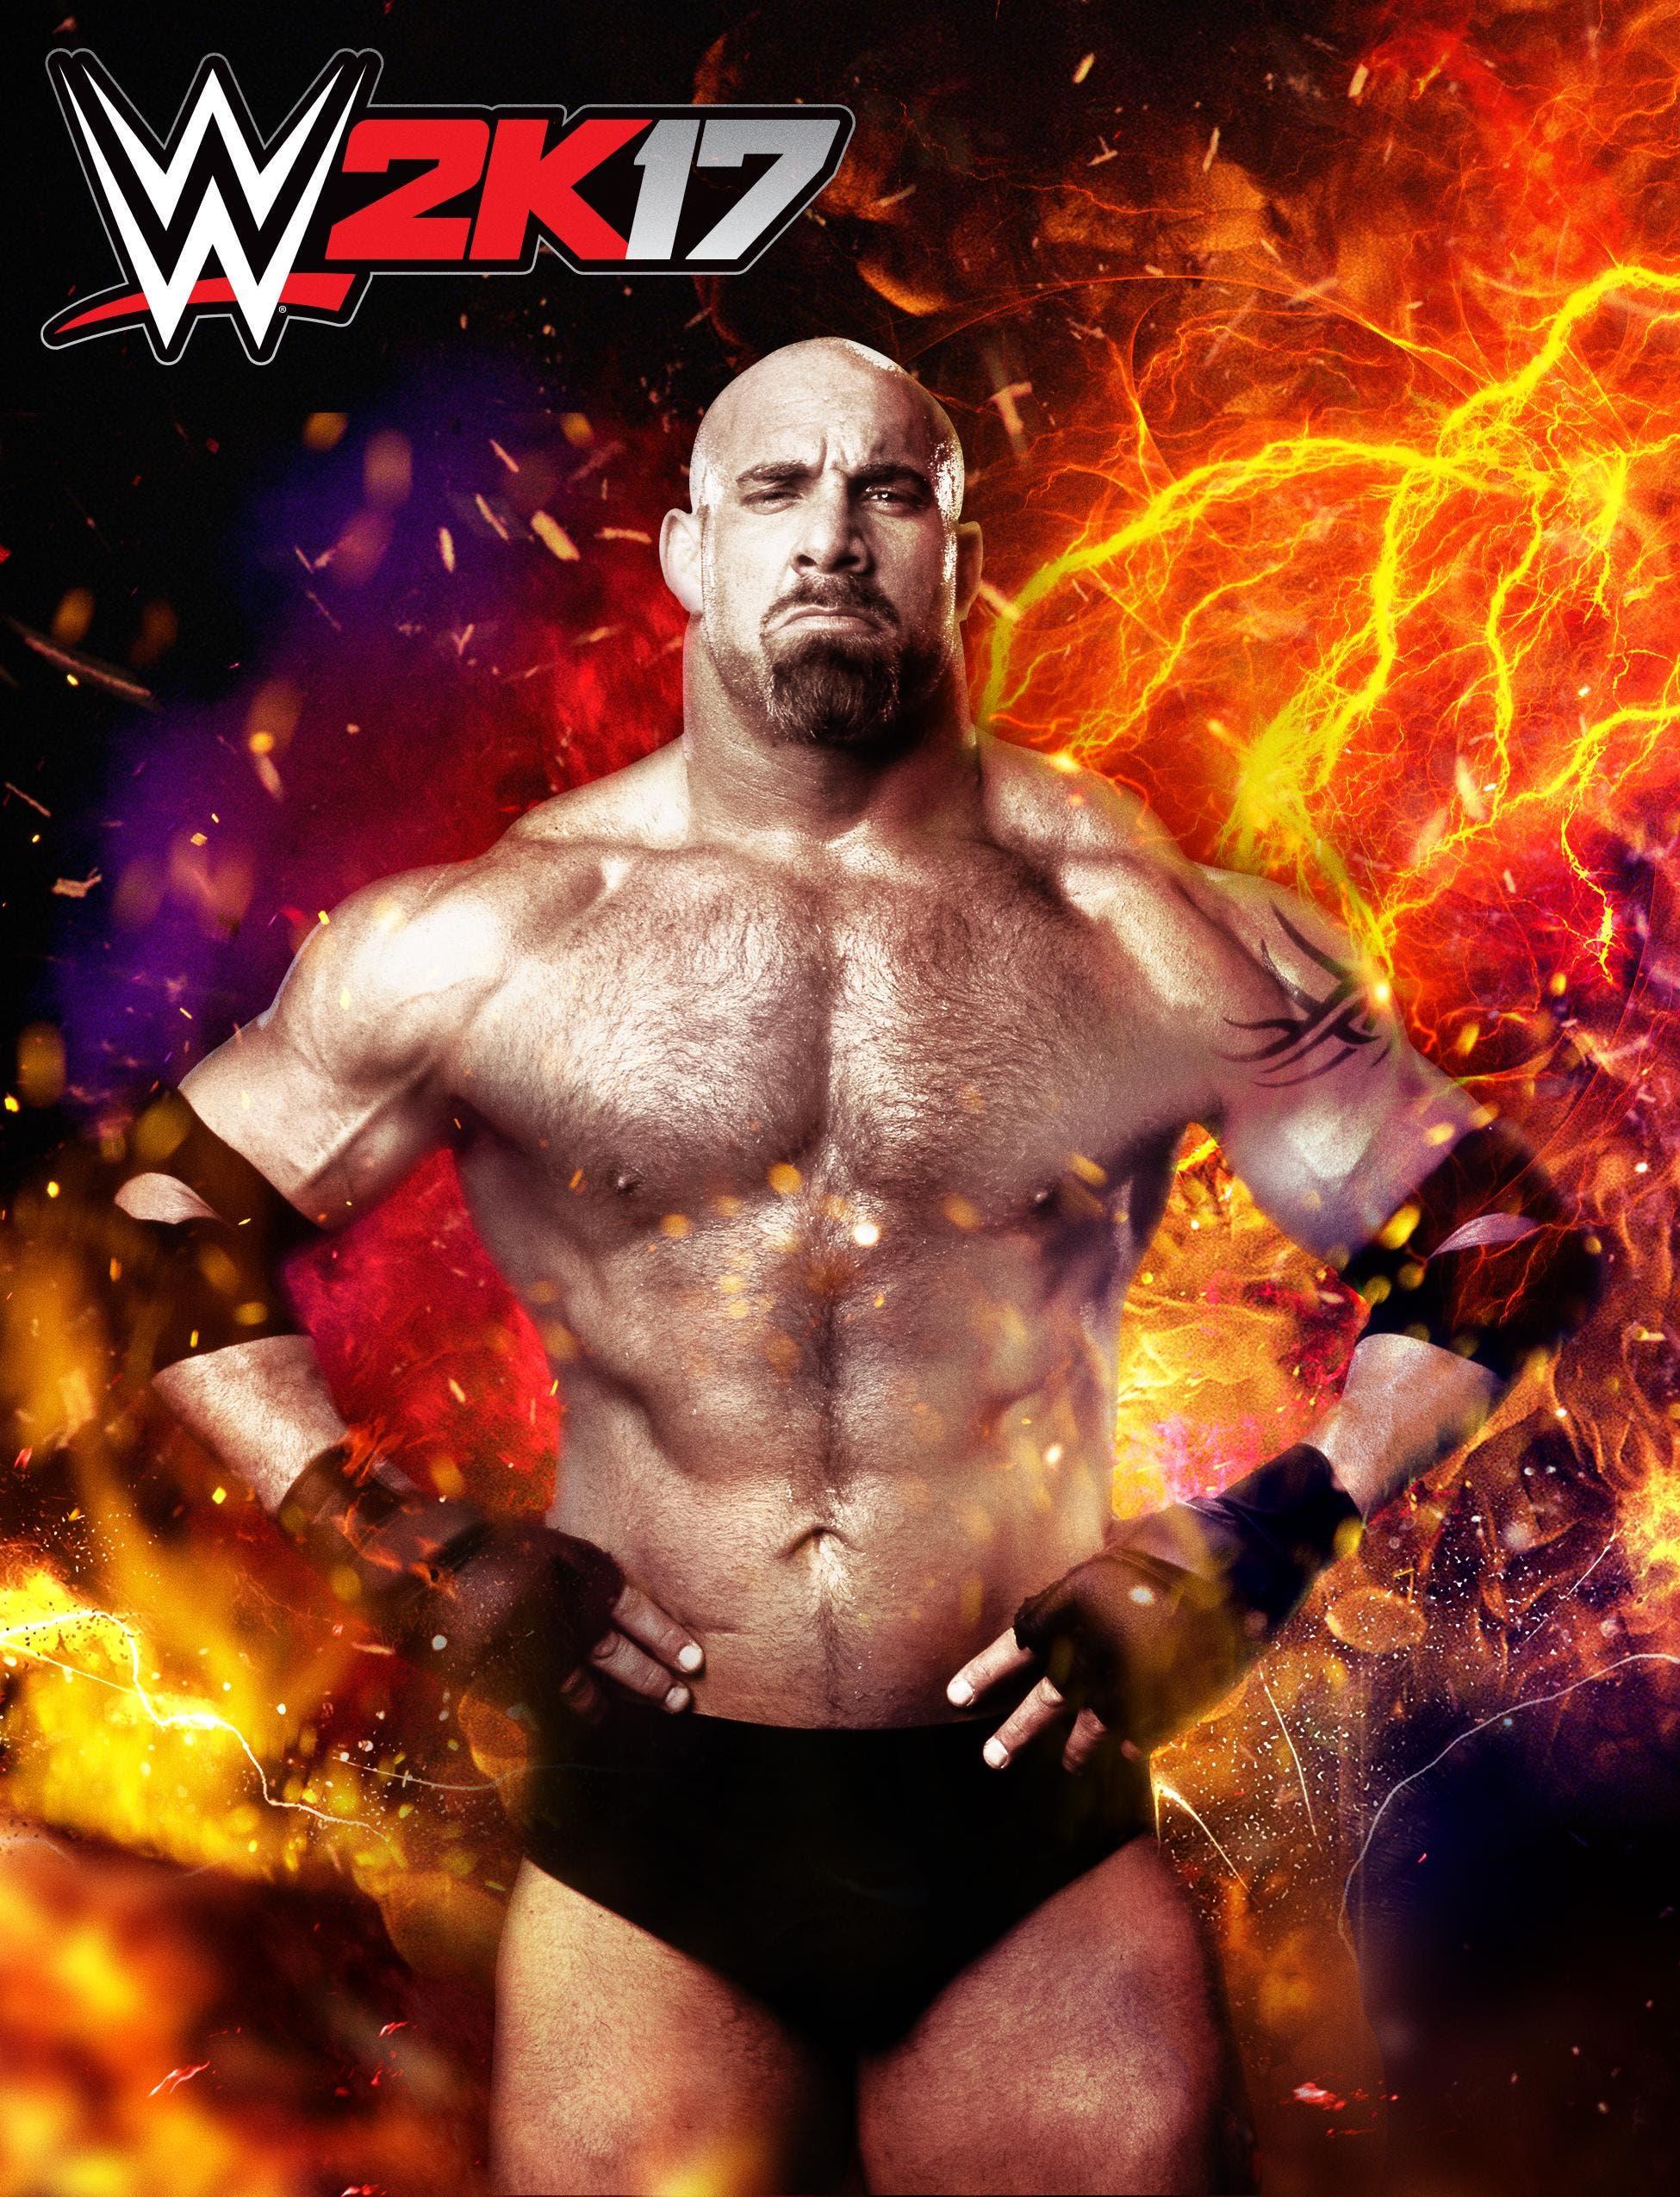 2KSMKT_WWE2K17_GOLDBERG_6.5x8.5-page-001